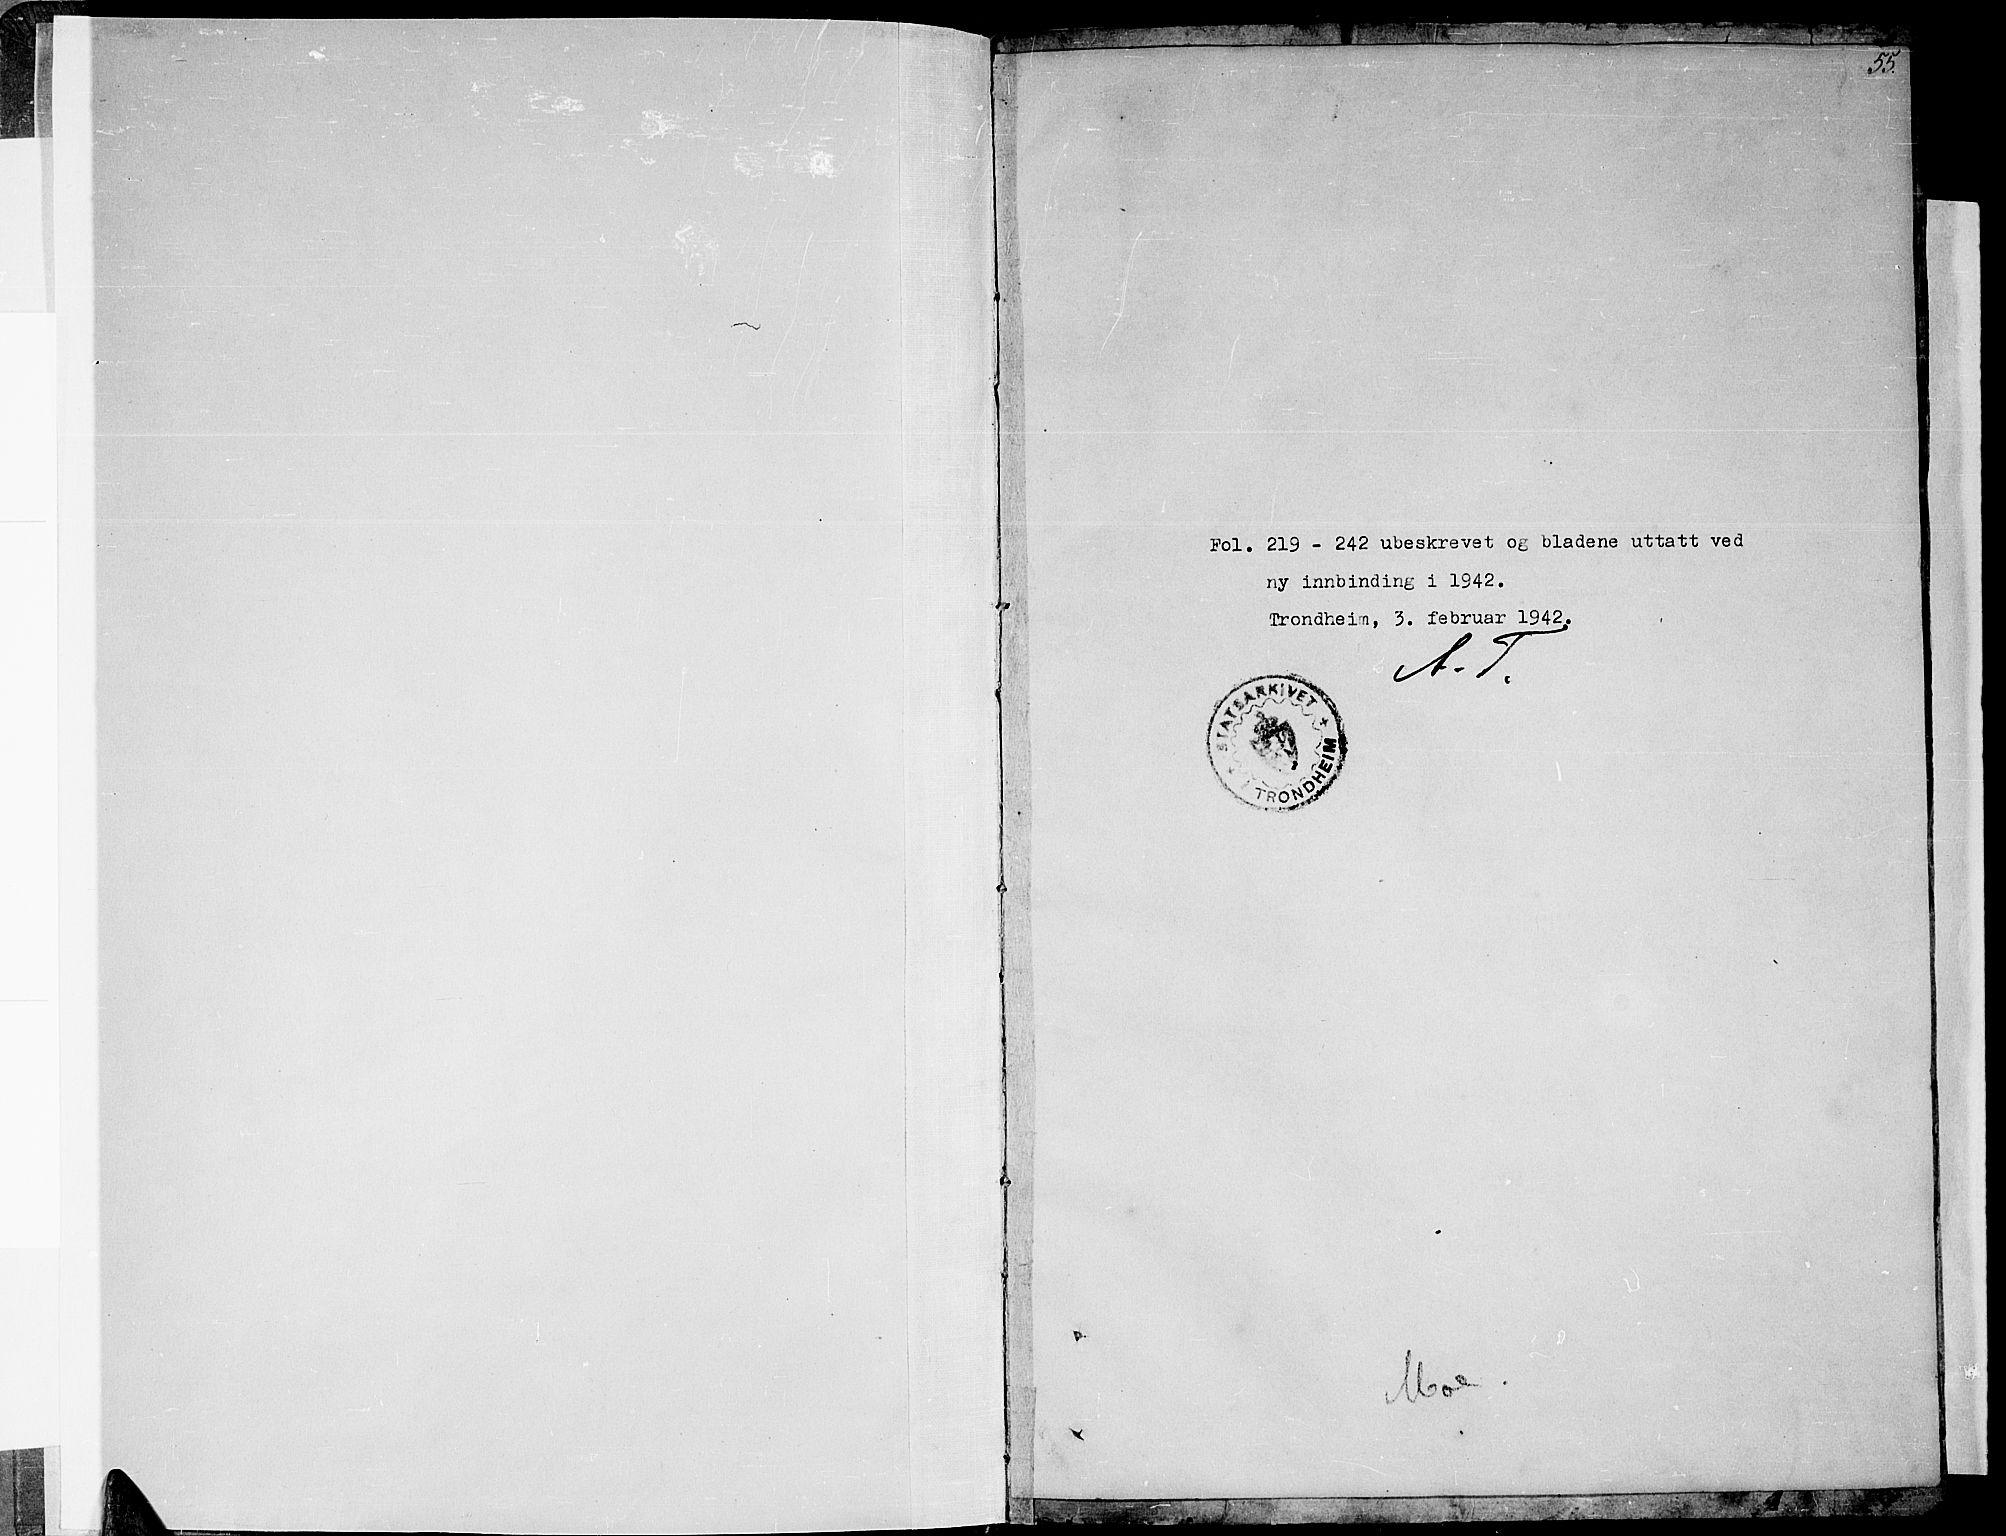 SAT, Ministerialprotokoller, klokkerbøker og fødselsregistre - Nordland, 827/L0415: Klokkerbok nr. 827C04, 1864-1886